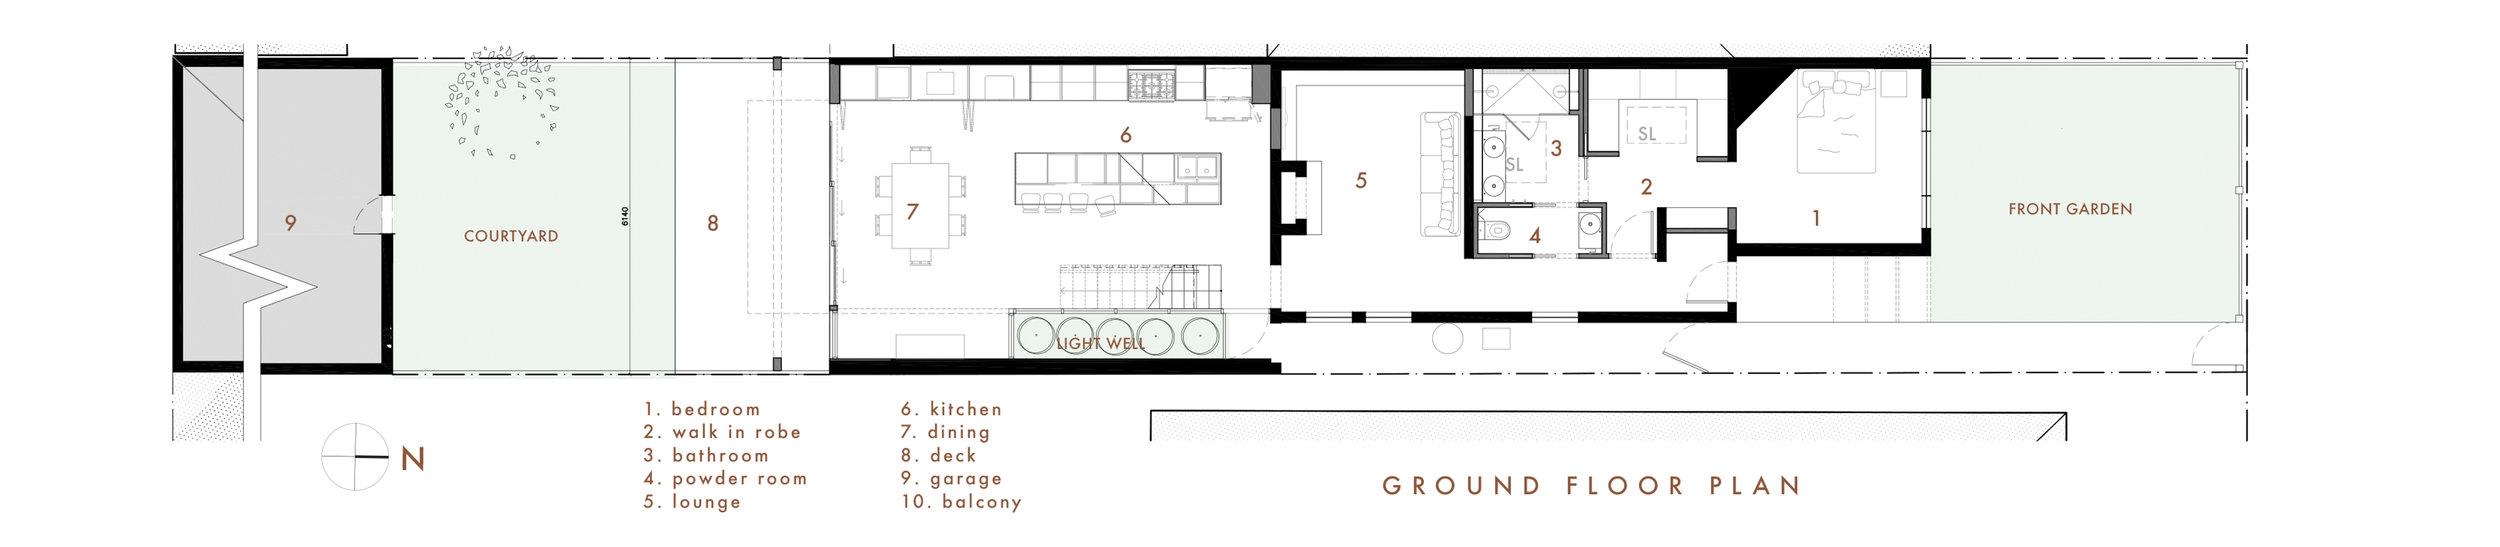 perched-house-rara-architect-the-design-emotive-16.jpg